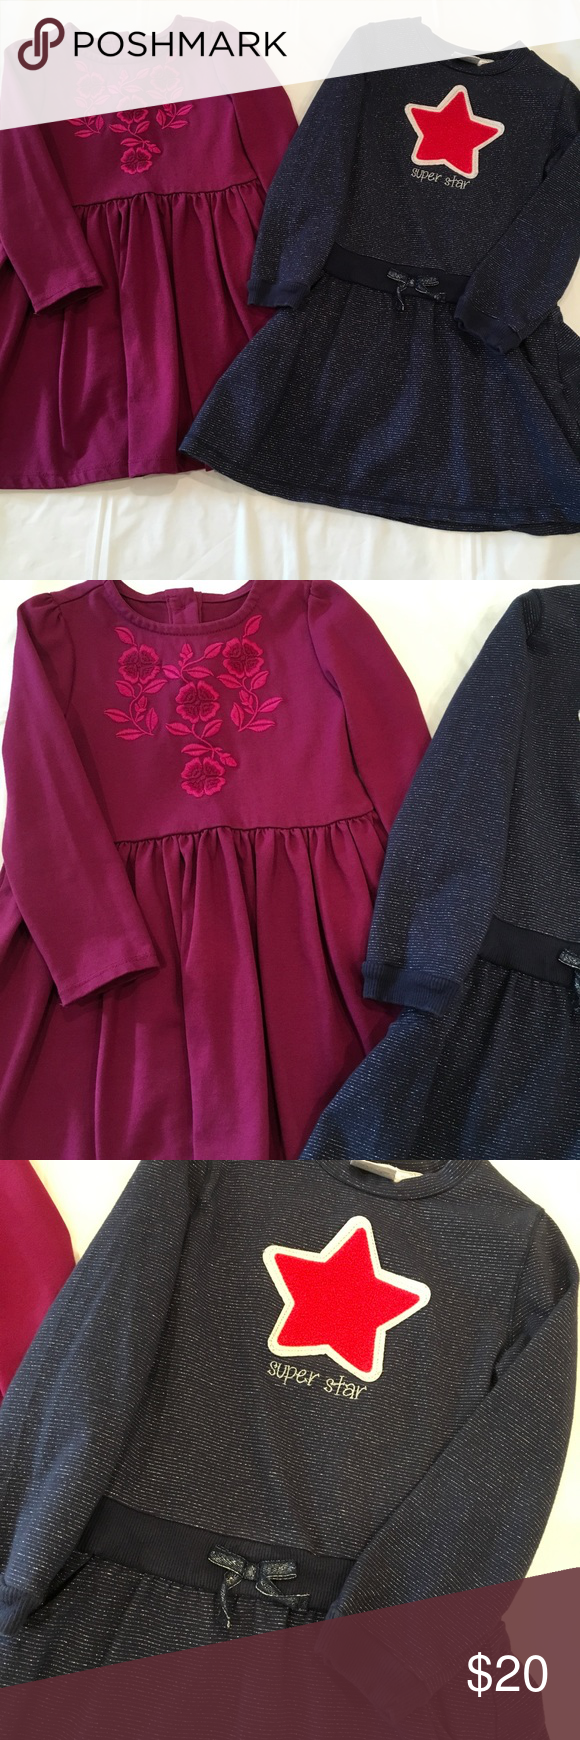 Long Sleeve 5t Dresses 2 Long Sleeve 5t Dresses In Excellent Condition Beautiful Deep Maroon Wine Color D Wine Colored Dresses Clothes Design Fashion Design [ 1740 x 580 Pixel ]